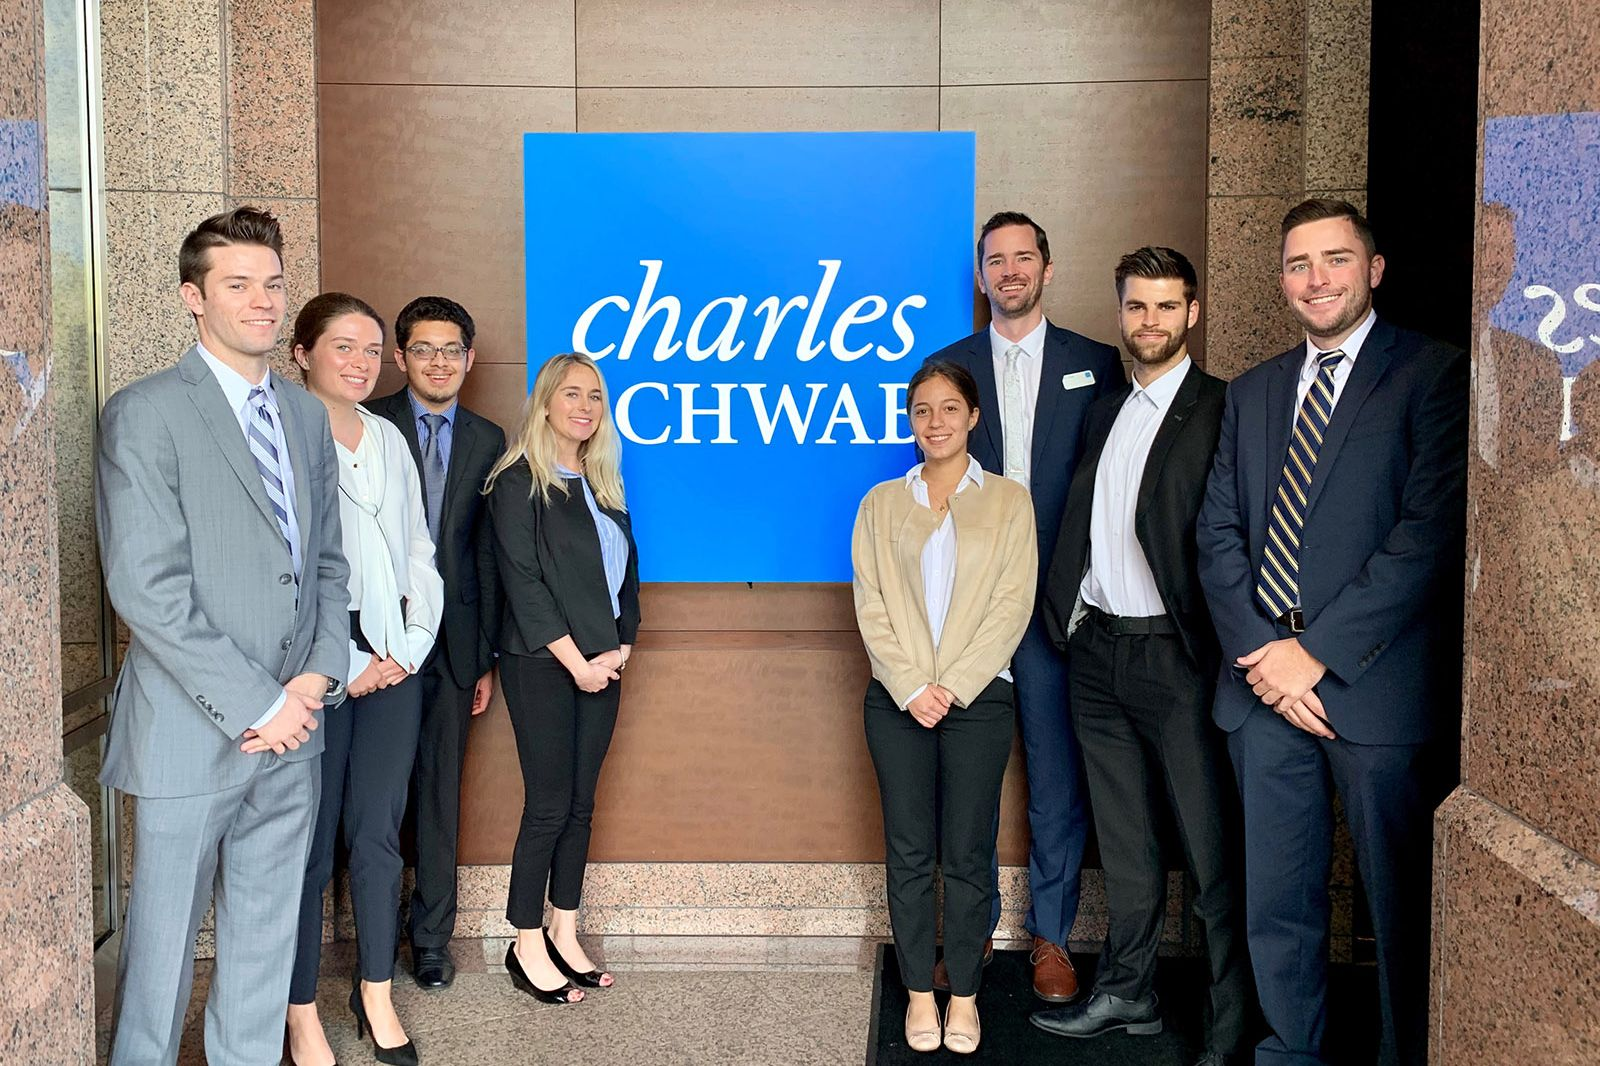 Rollins Students visit Charles Schwab offices.